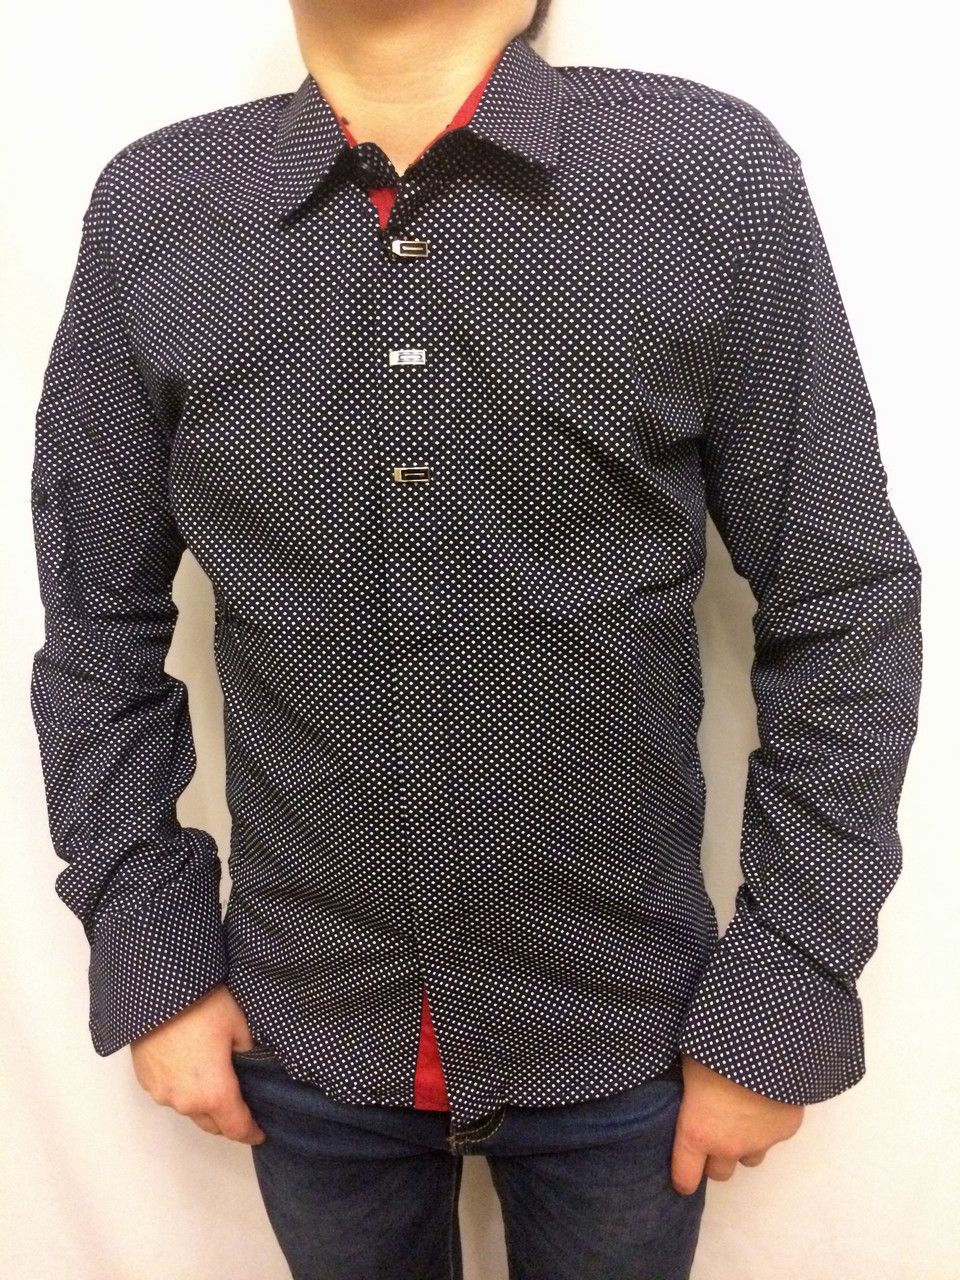 Рубашка для подростка без окантовки планки, фото 1